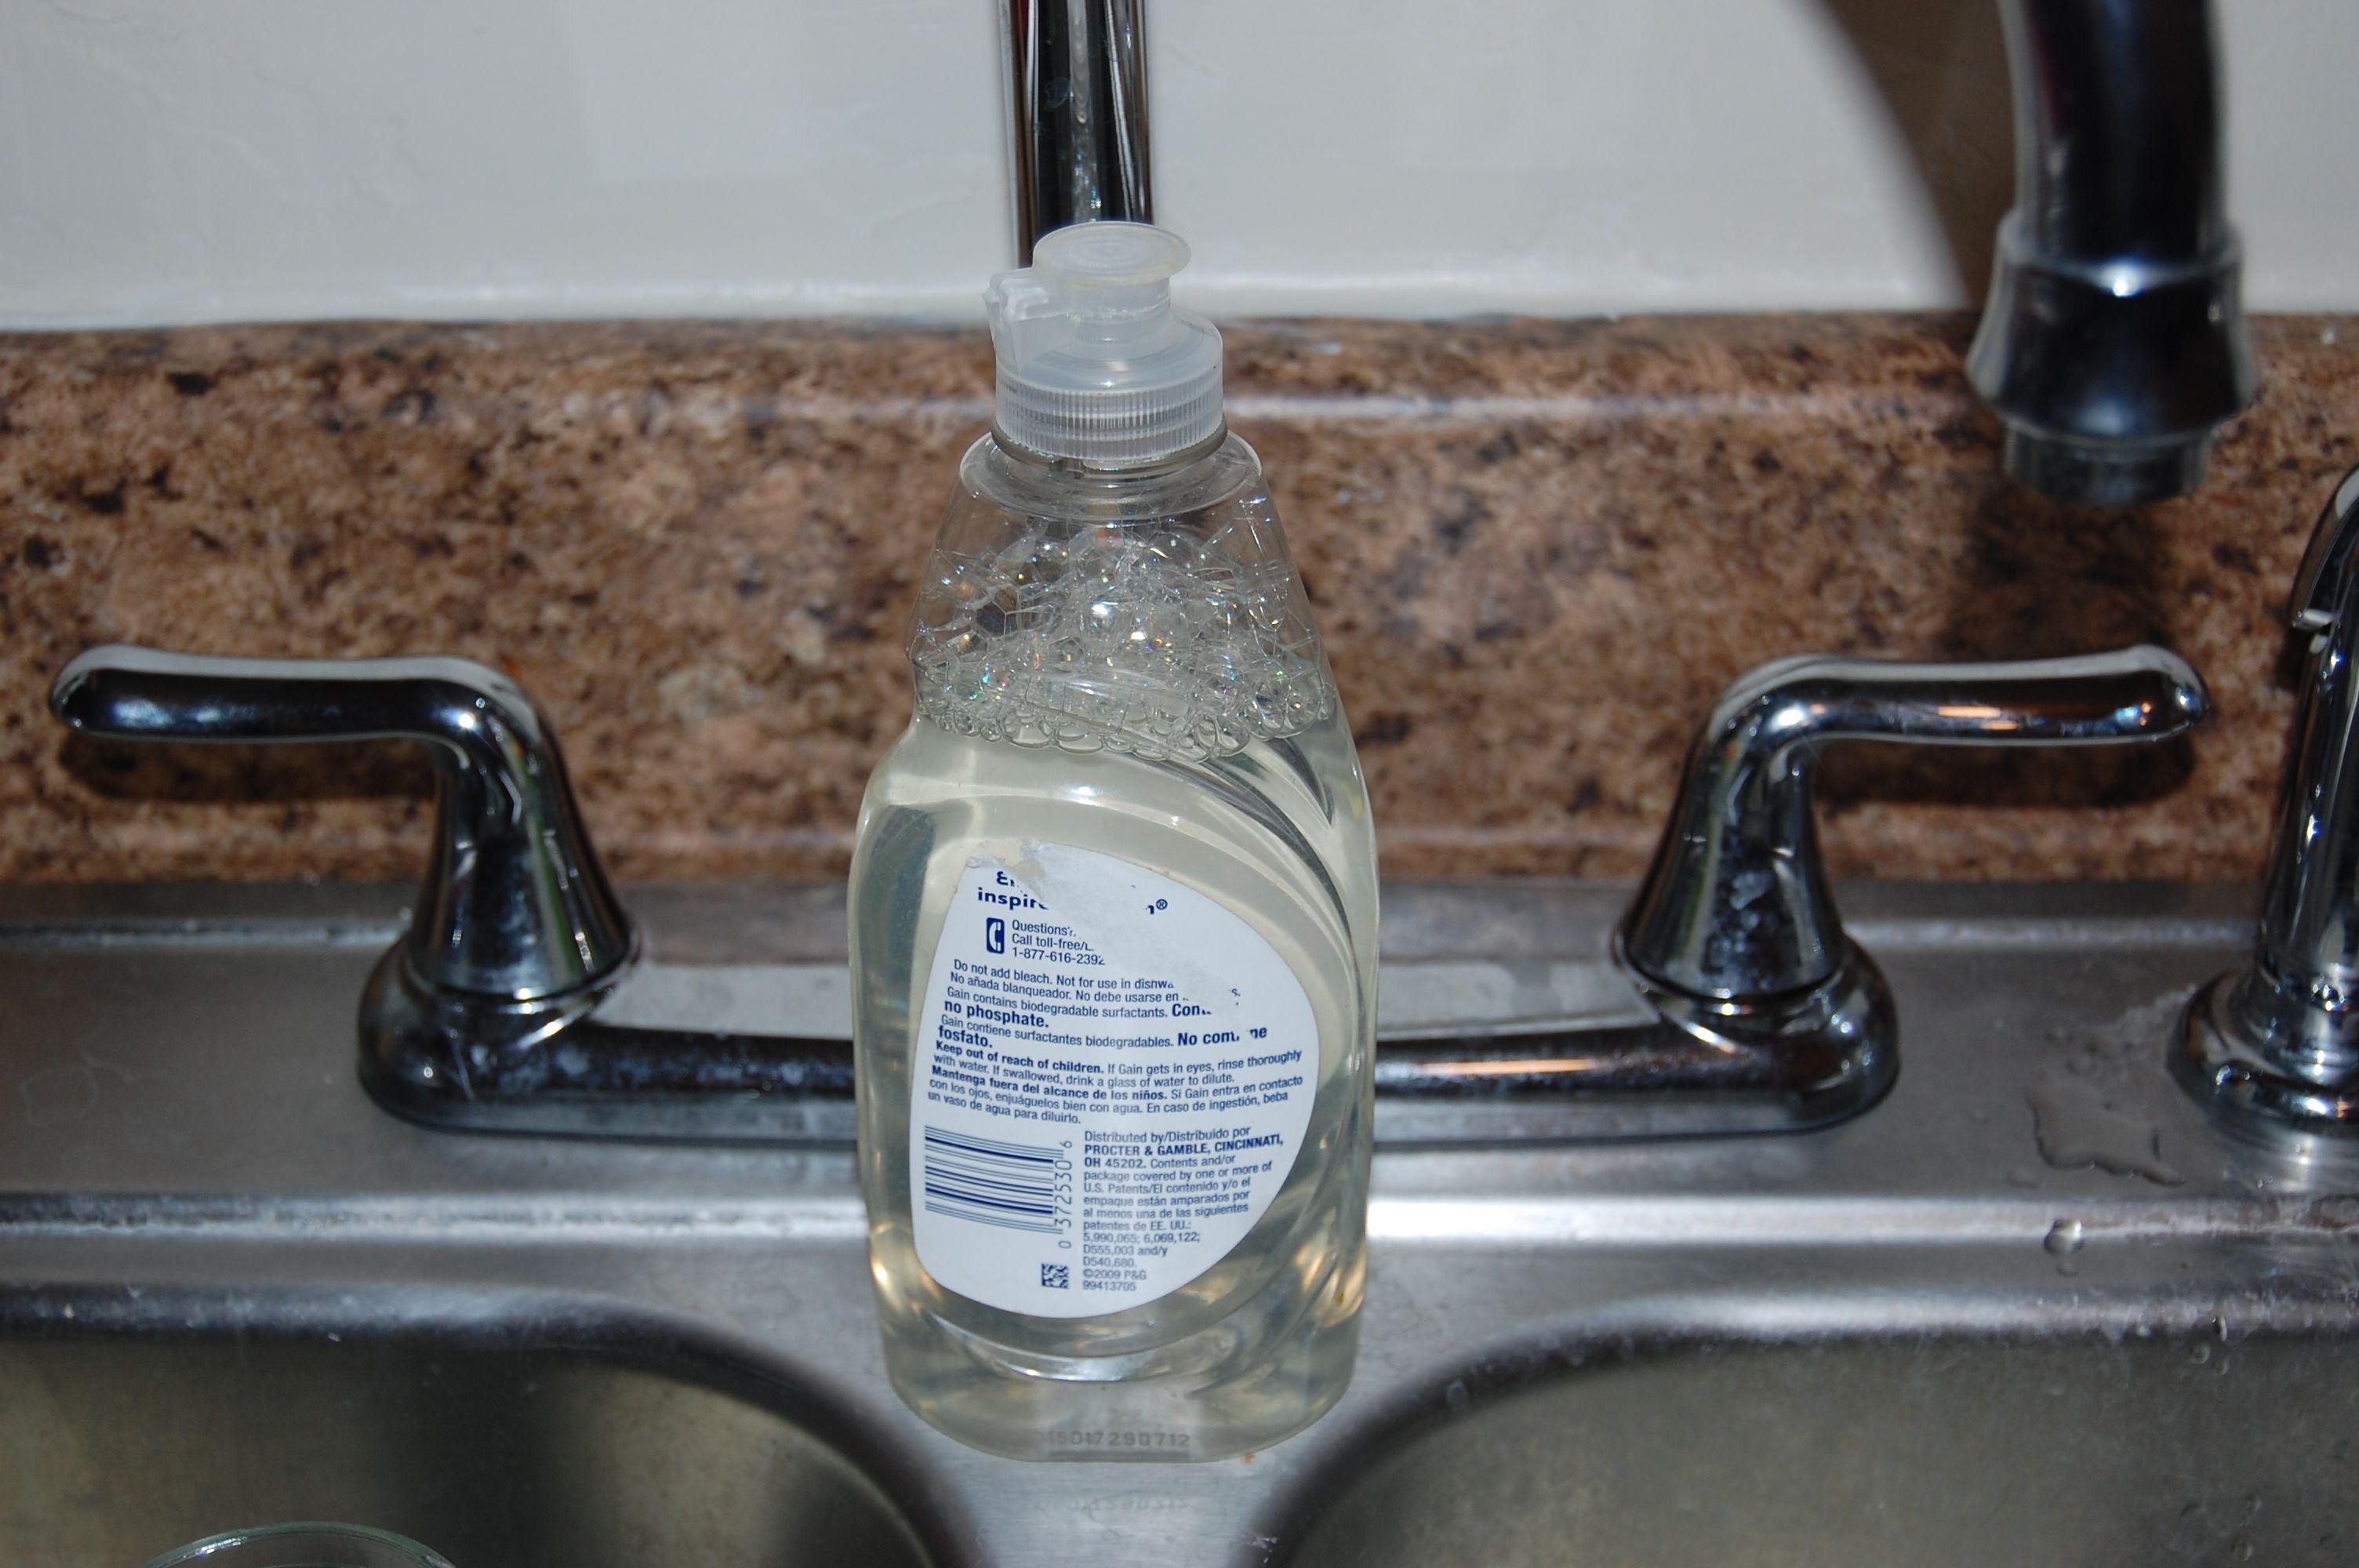 Homemade Dish Soap Sample Homemade dish soap